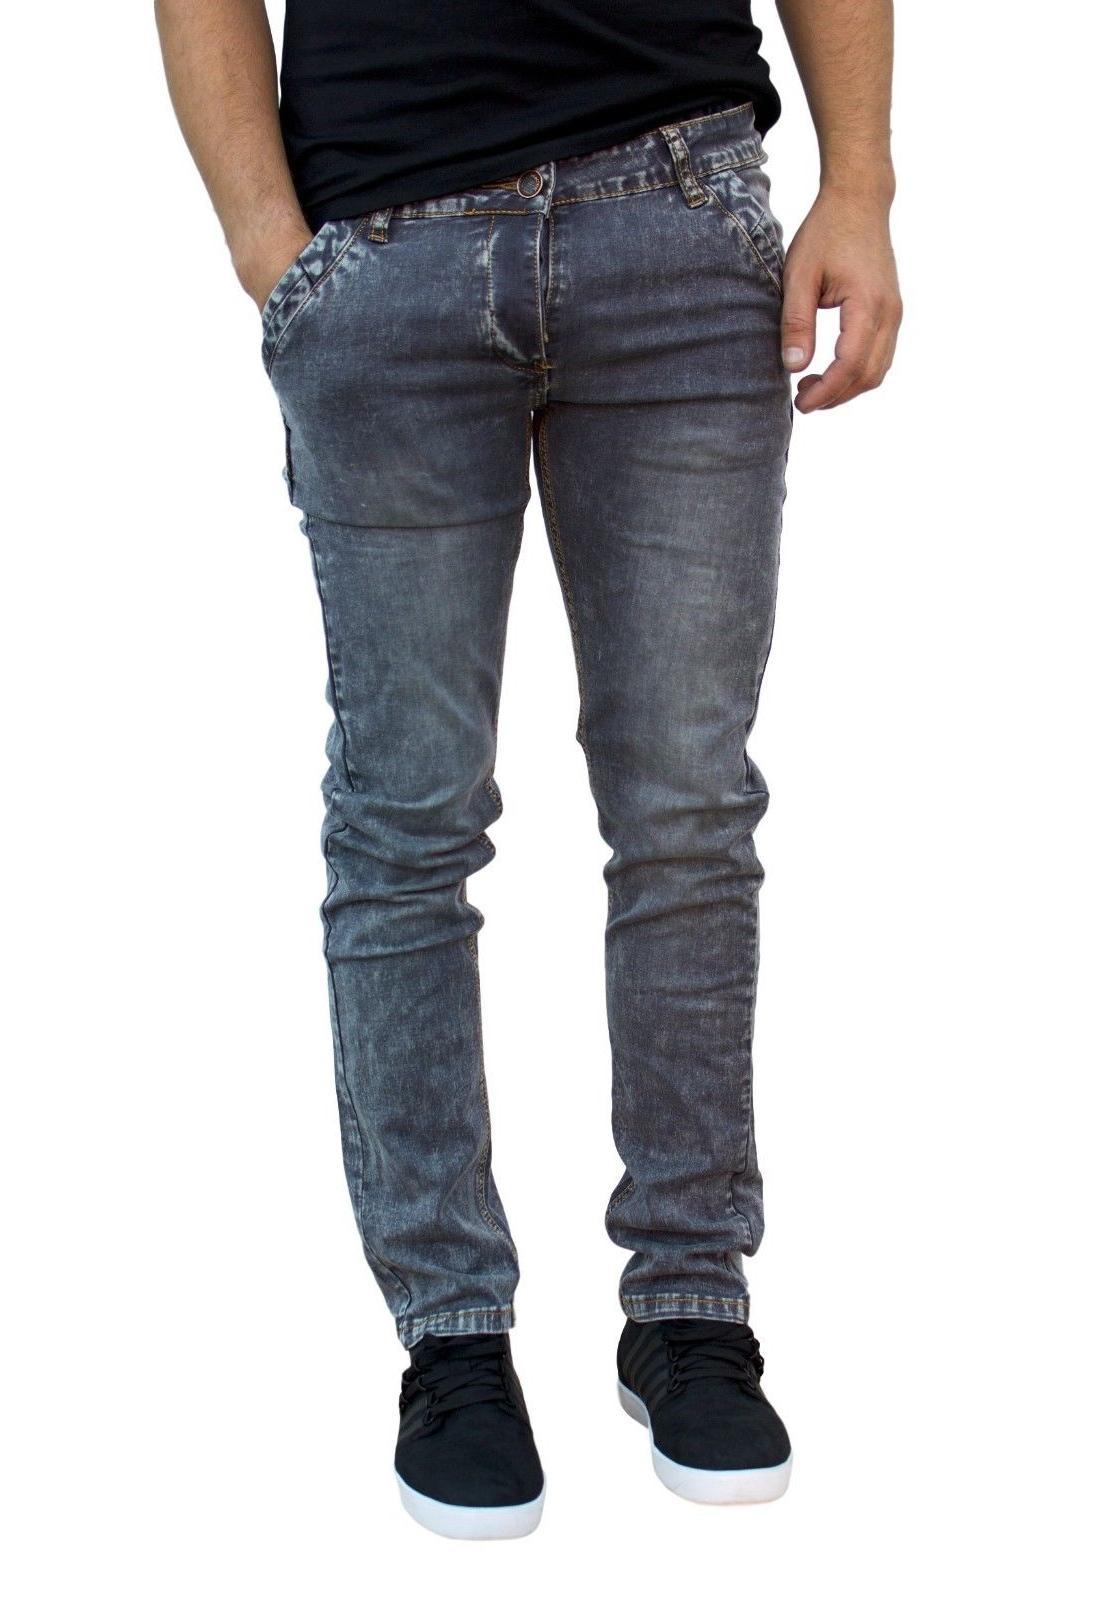 Men's jeans, Slim fit Stretch denim